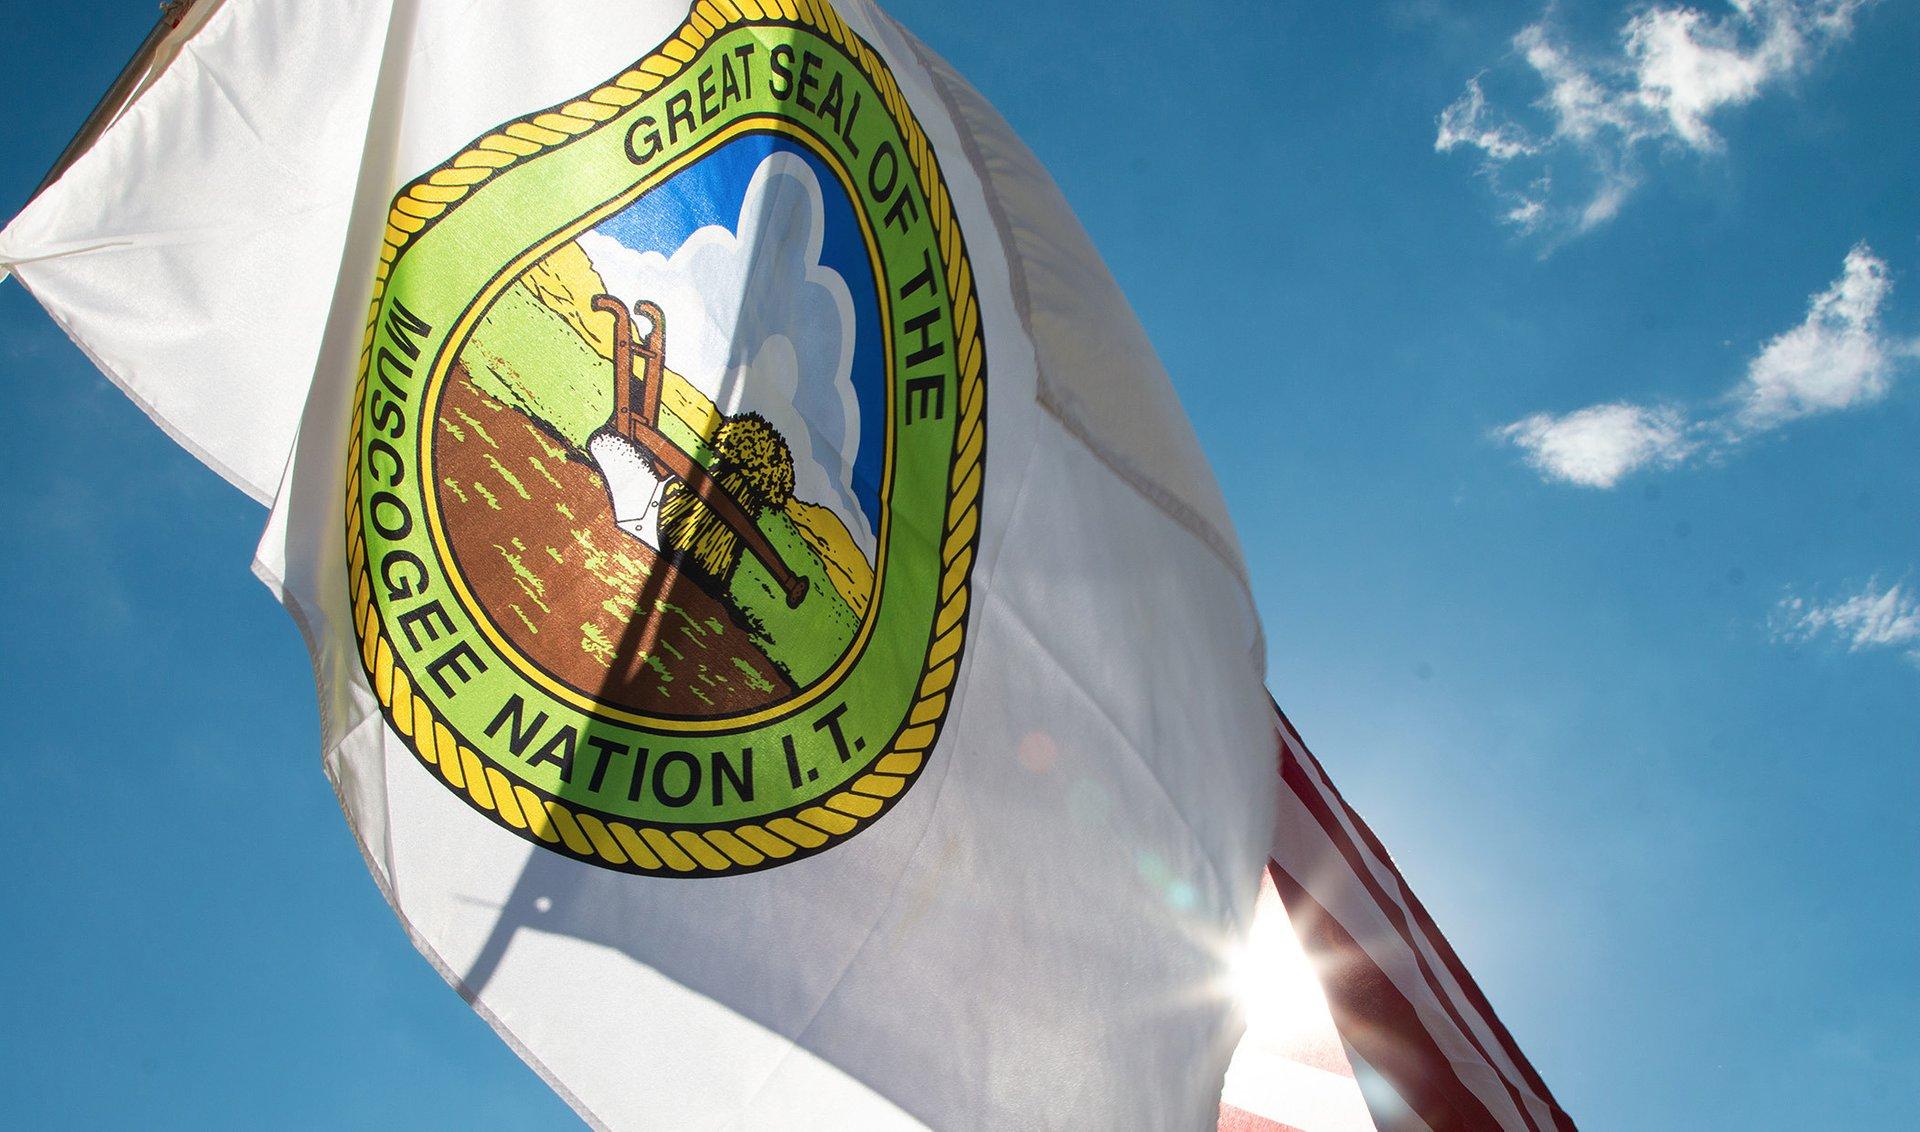 Muscogee (Creek) Nation statement regarding U.S. Supreme Court decision